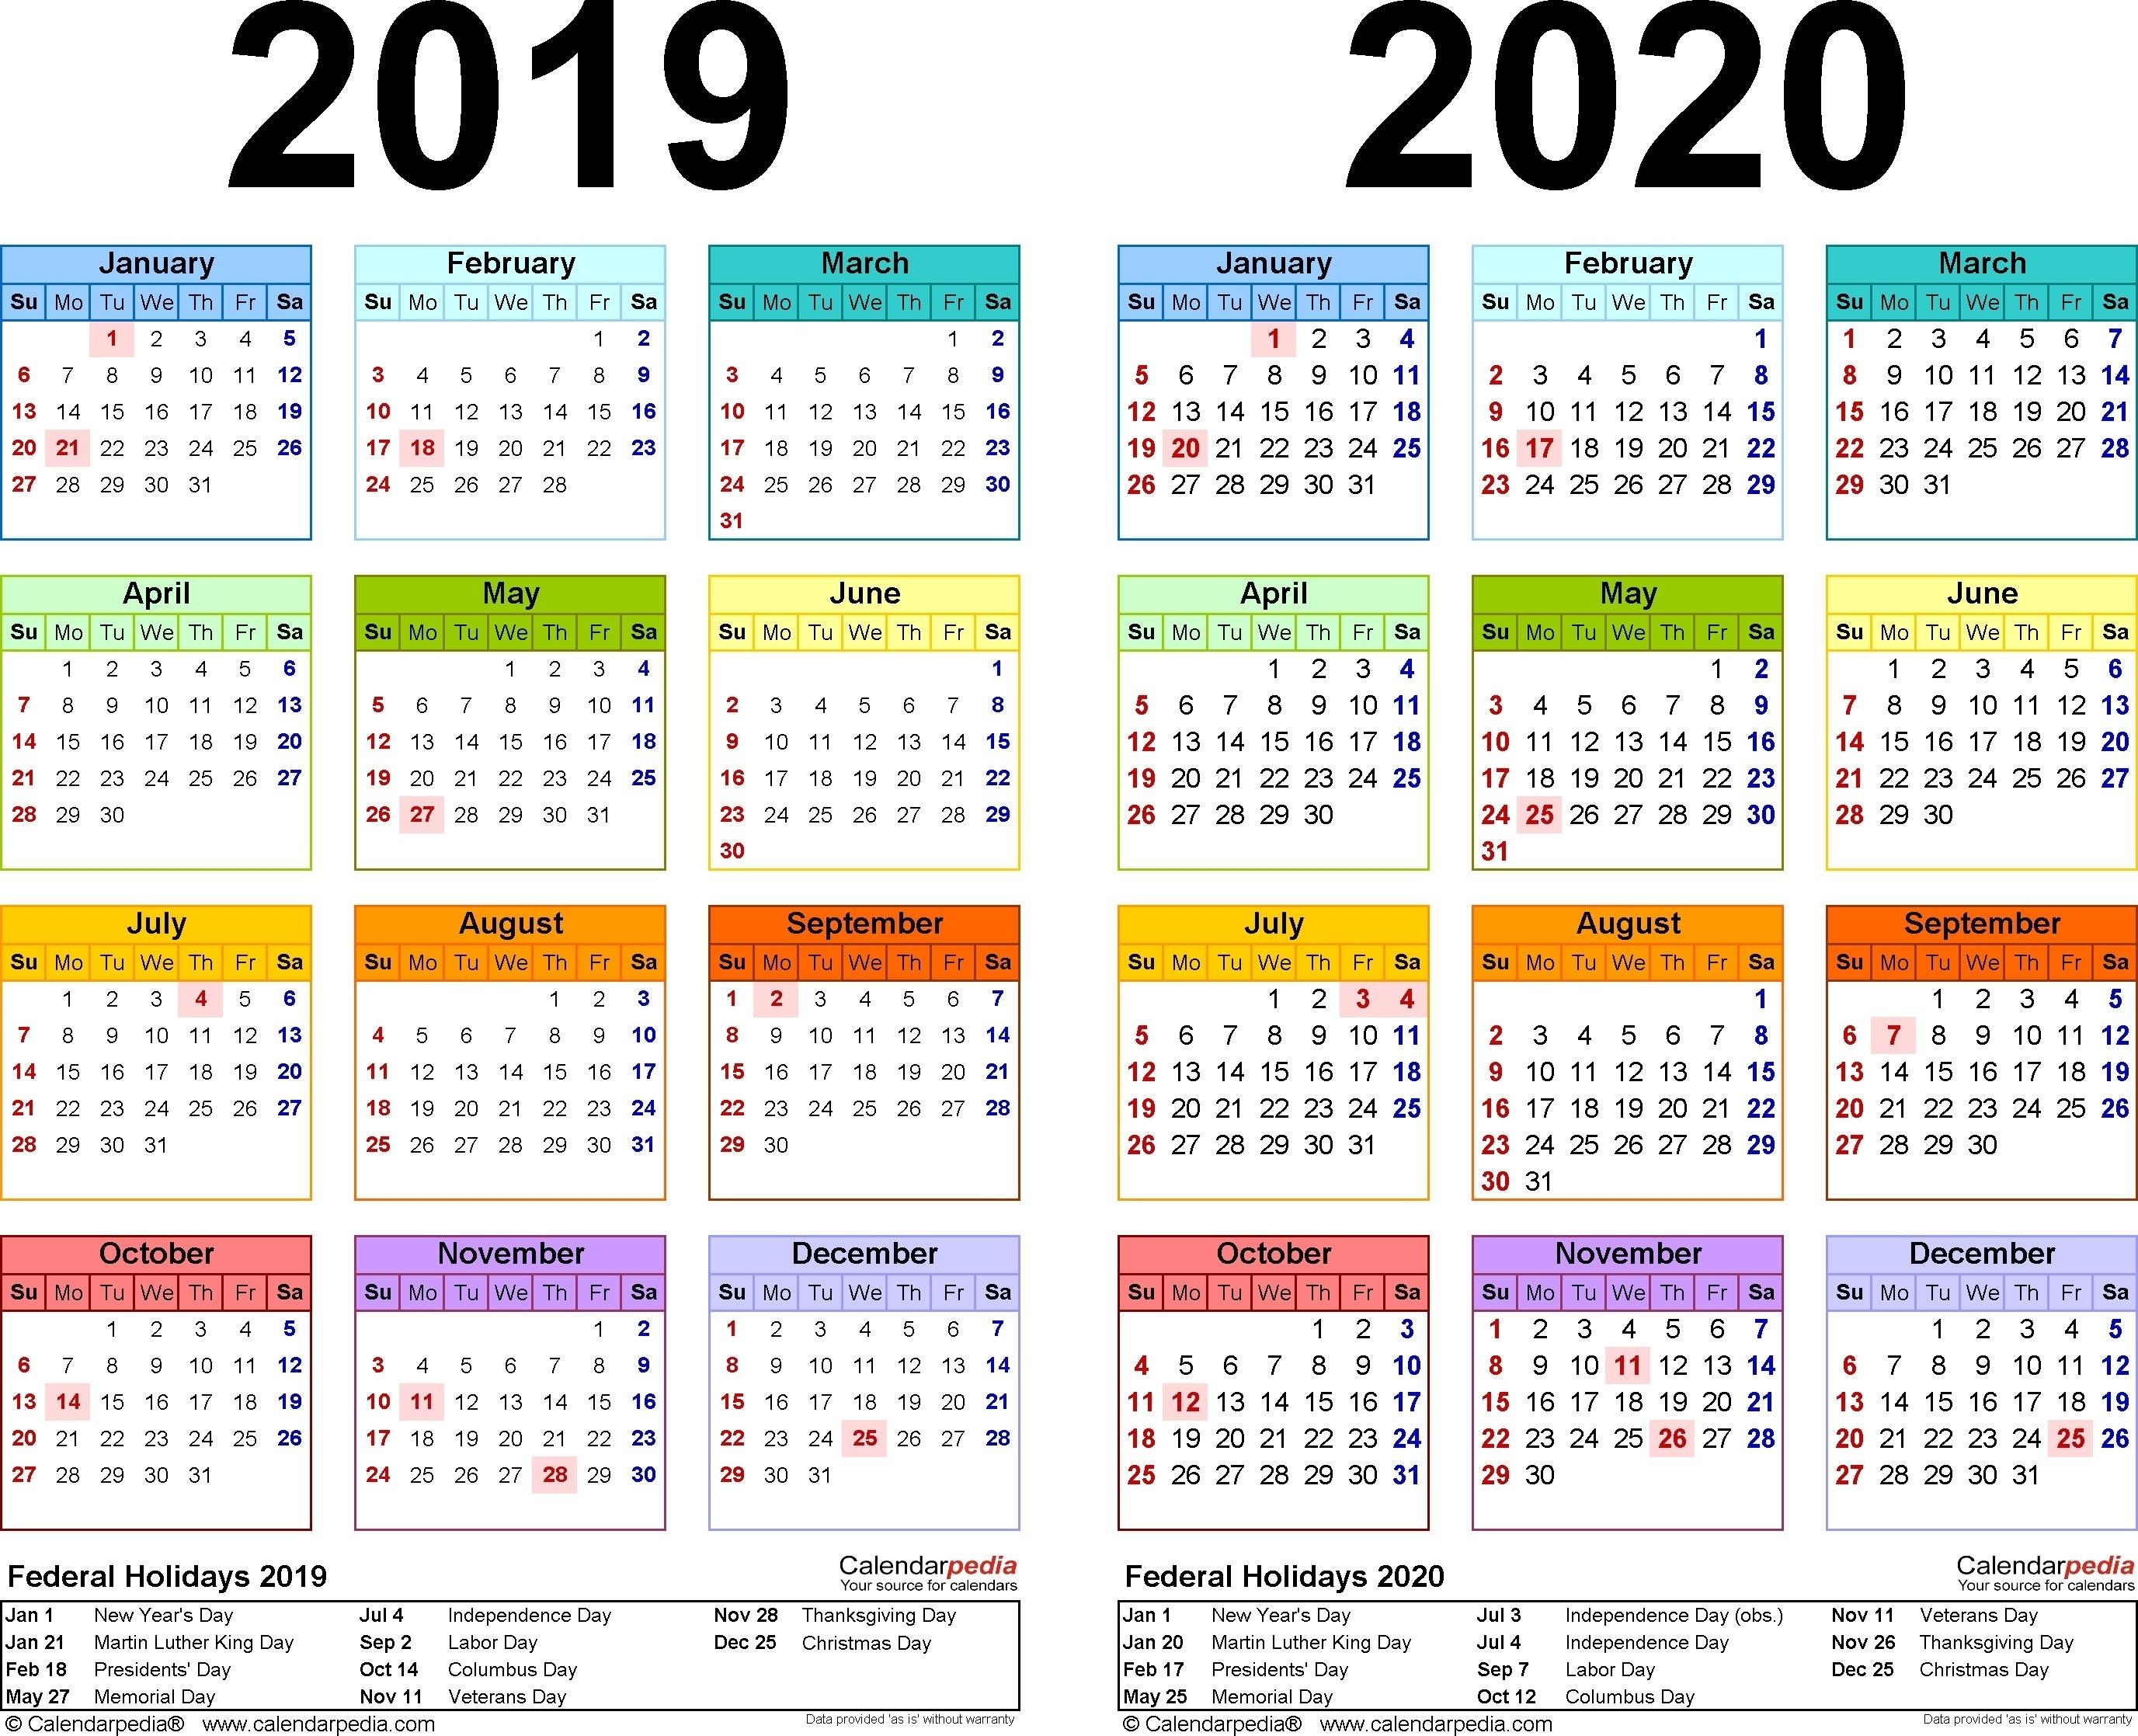 2020 Qld School Calendar Printable | Calendar Printable